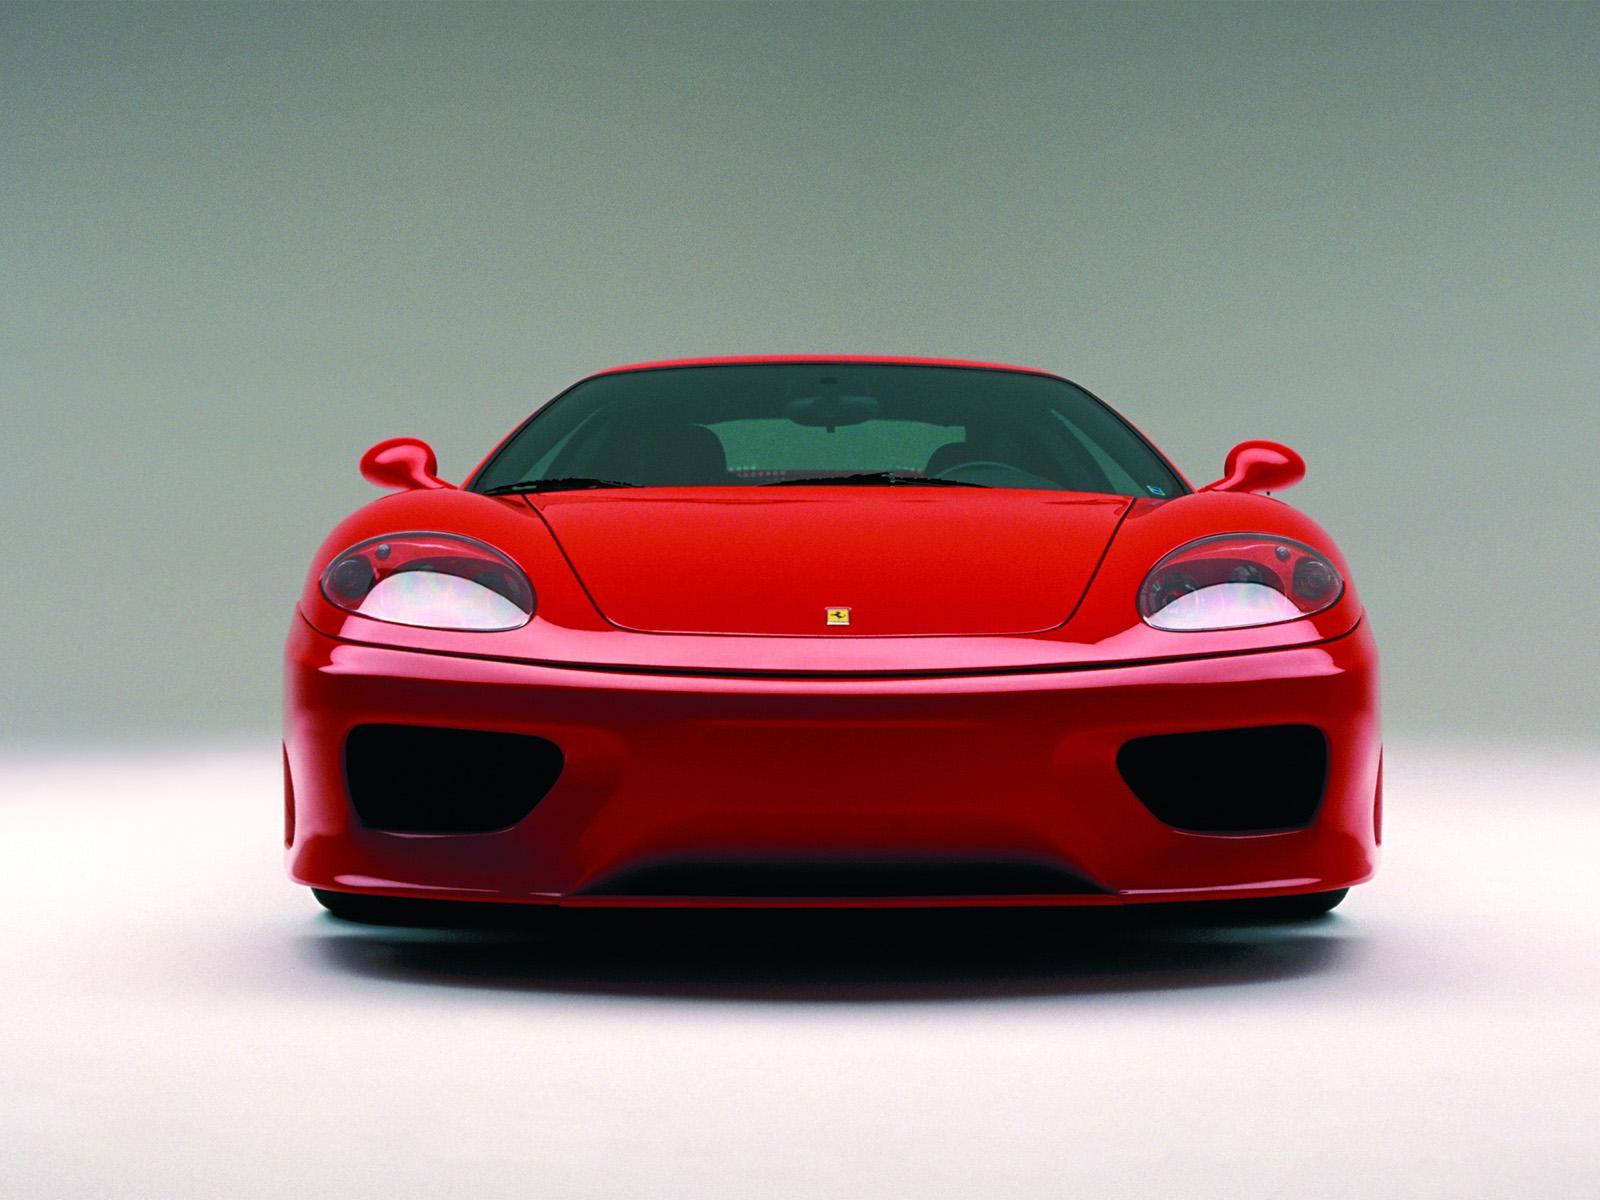 pic-link-https-www-carsbase-com-photo-novitec-rosso-novitec-rosso-ferrari-f360-f1-supersport-mk240-pic28076-jpg